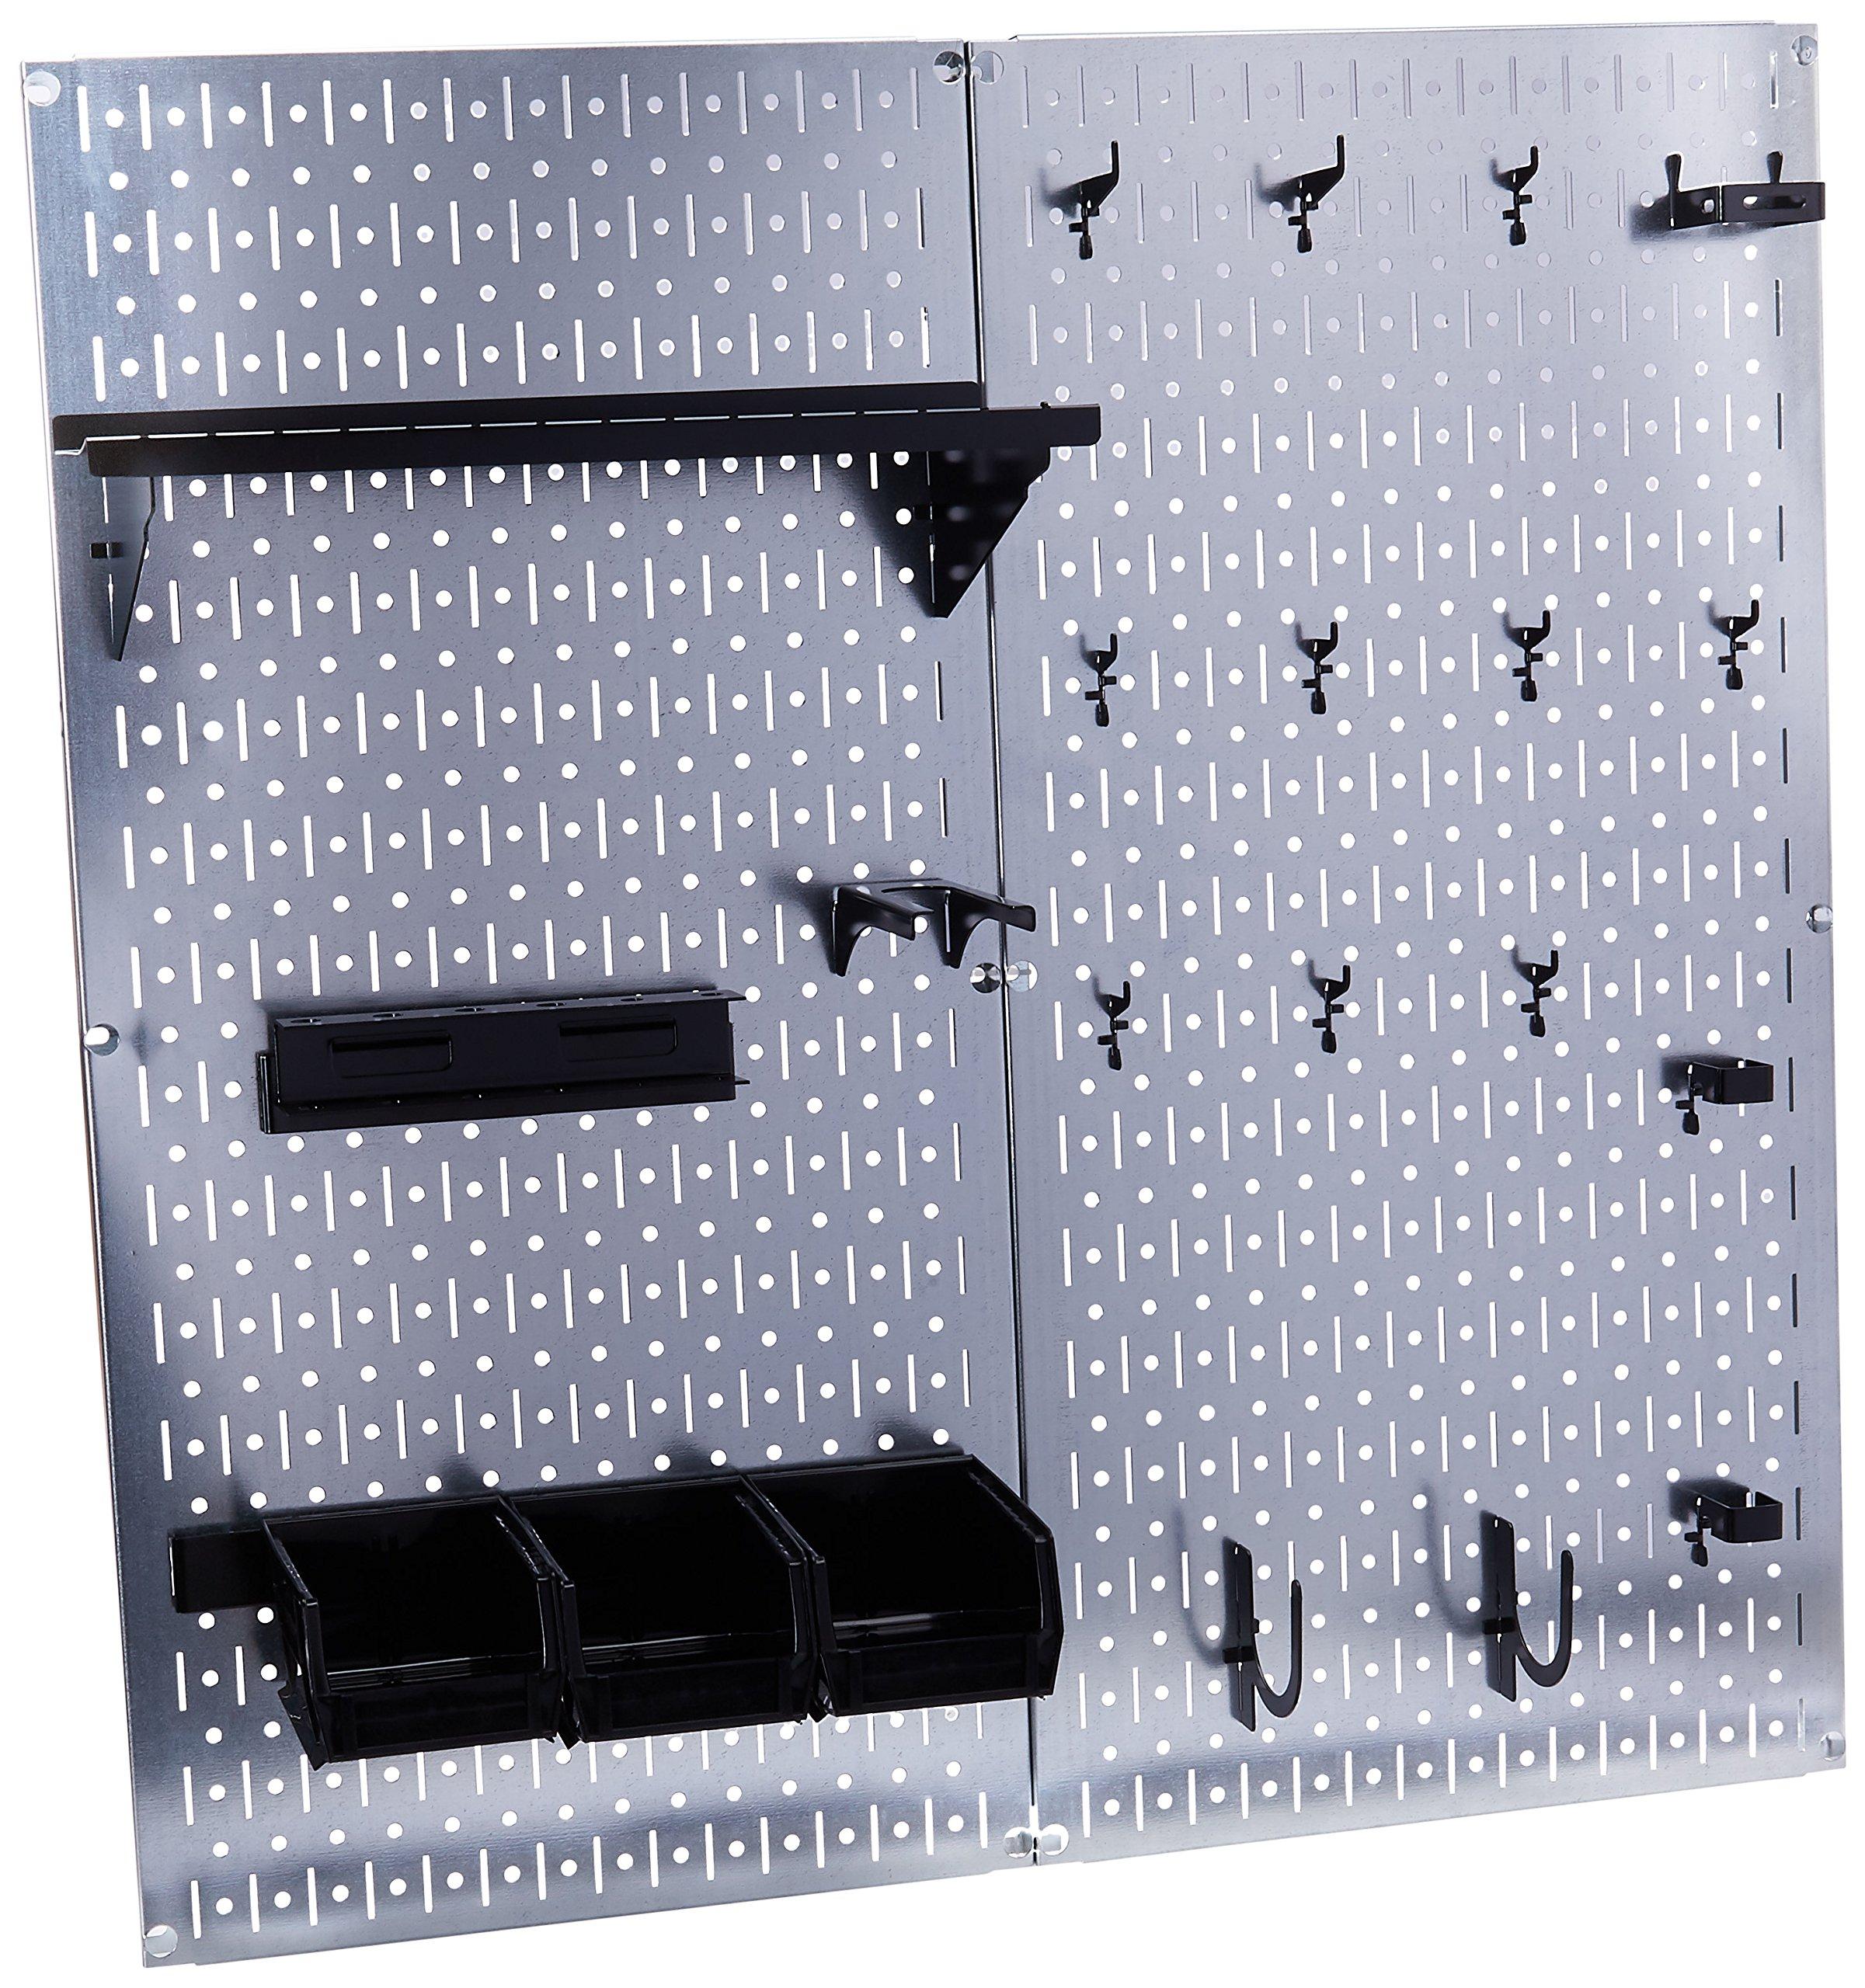 Wall Control 30-WGL-200GVB Galvanized Steel Pegboard Tool Organizer by Wall Control